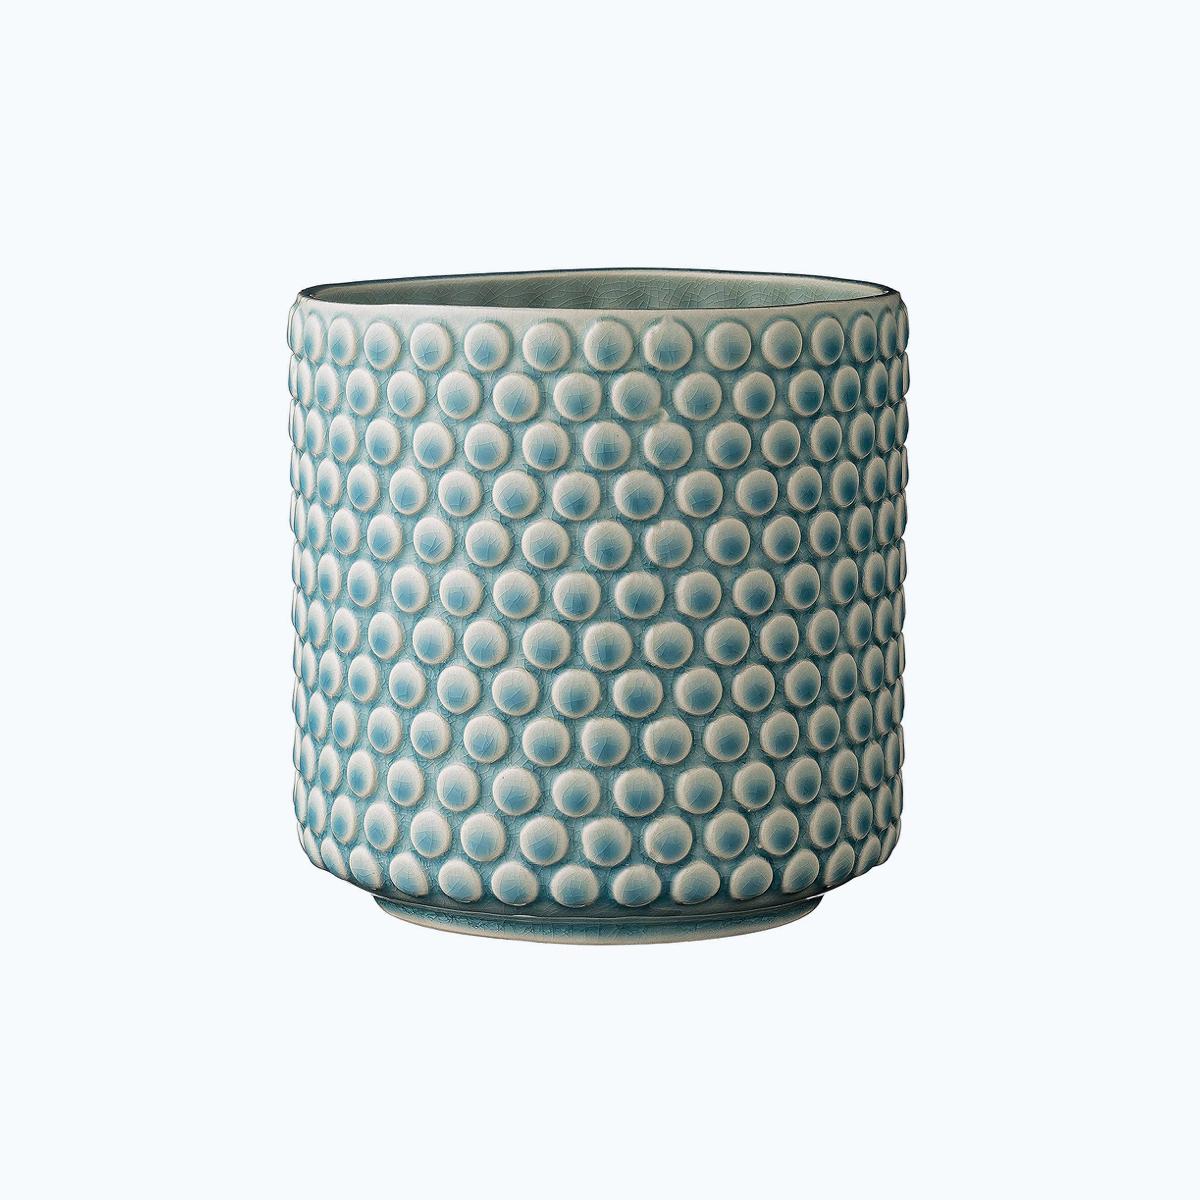 Stoneware Pot with Crackle Finish